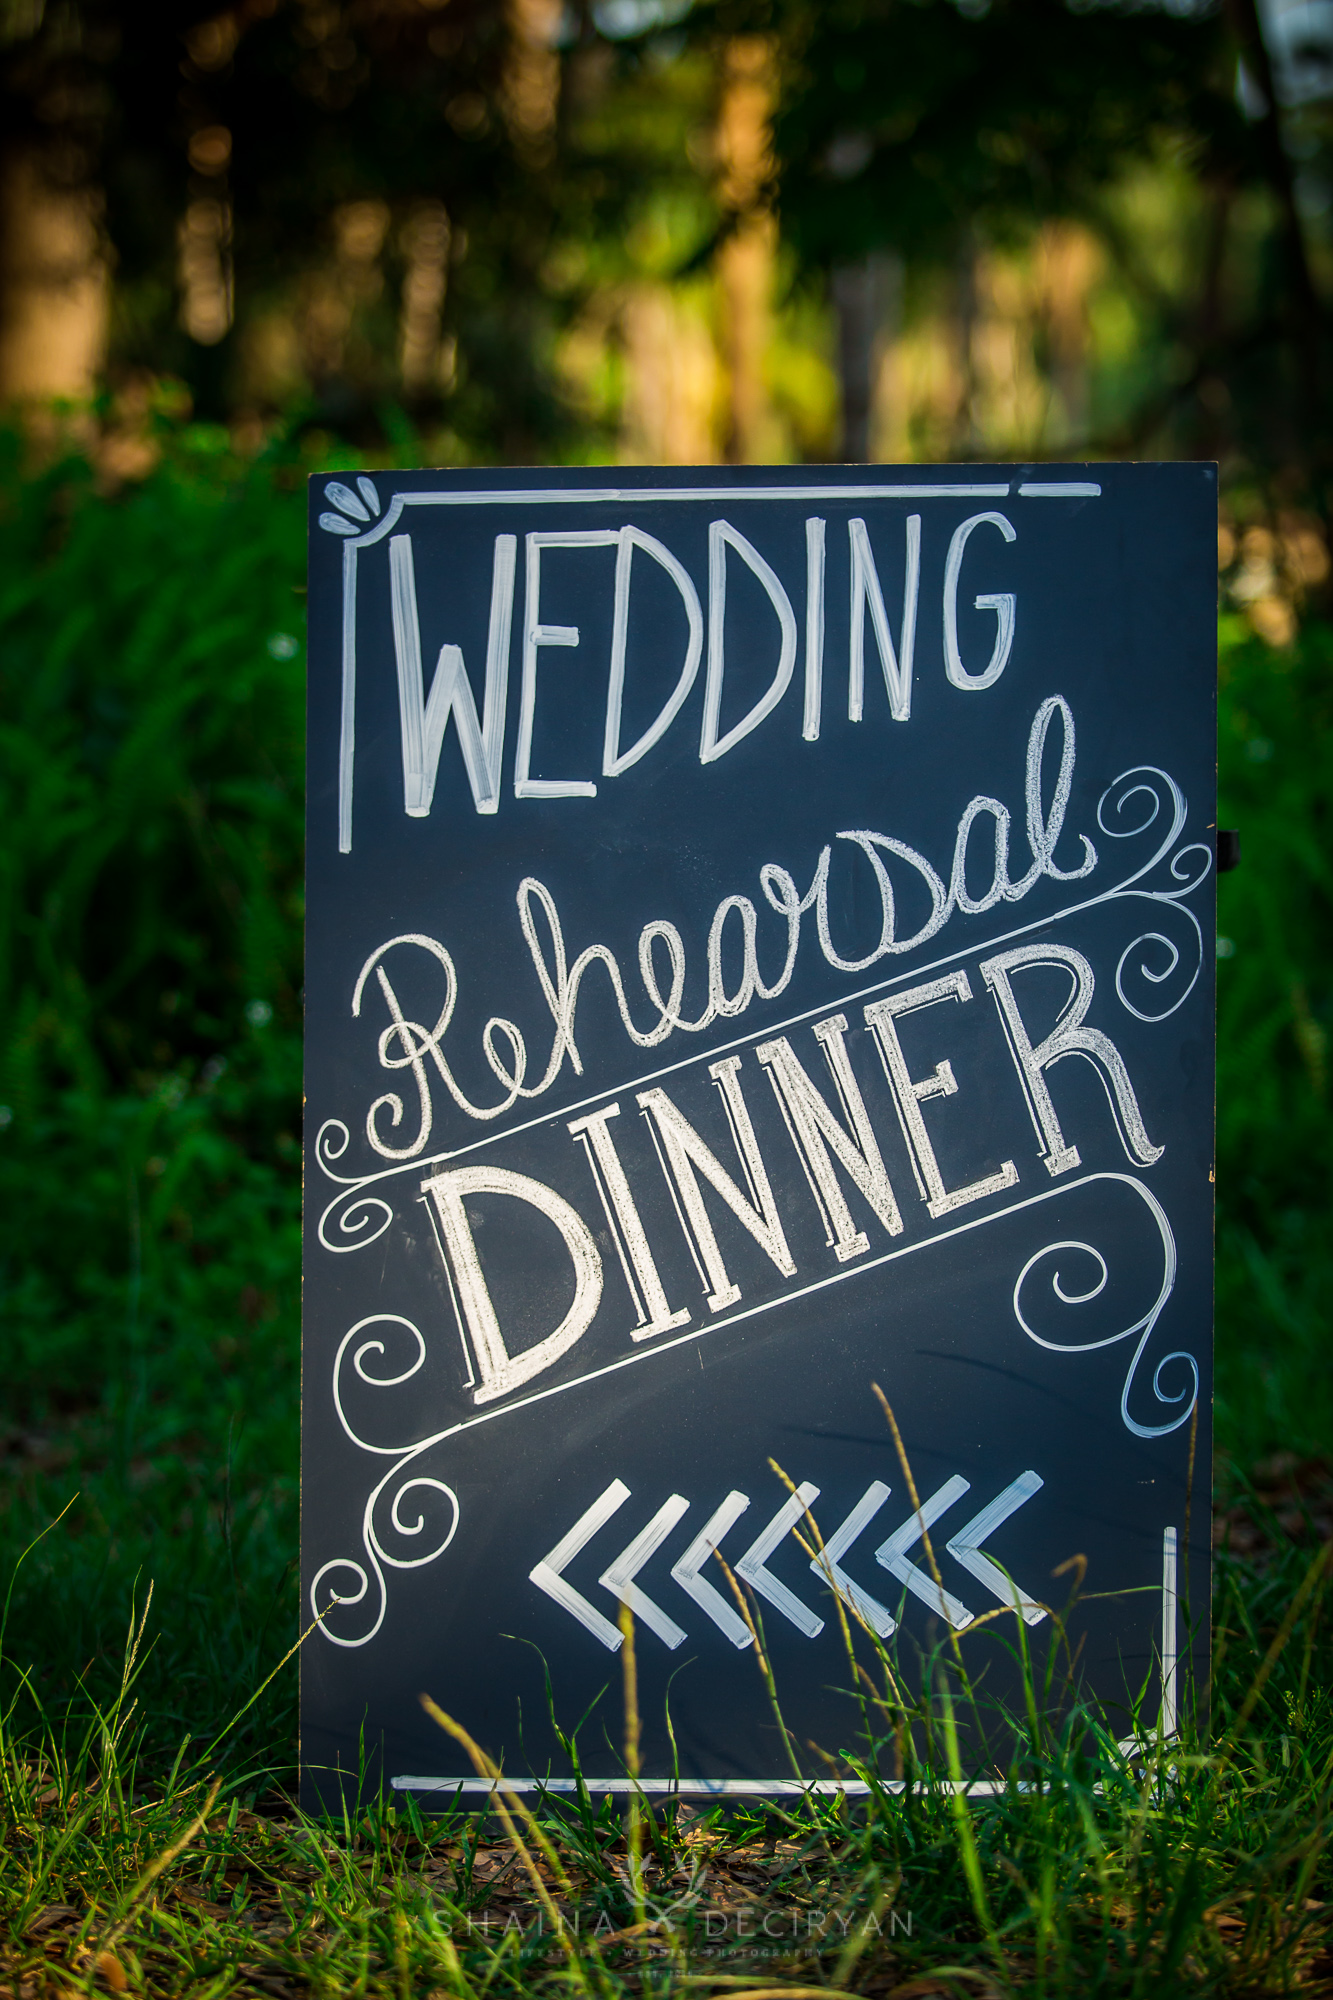 Jordan barbara wedding sanford rehearsal dinner sneak peak -0003-2.jpg